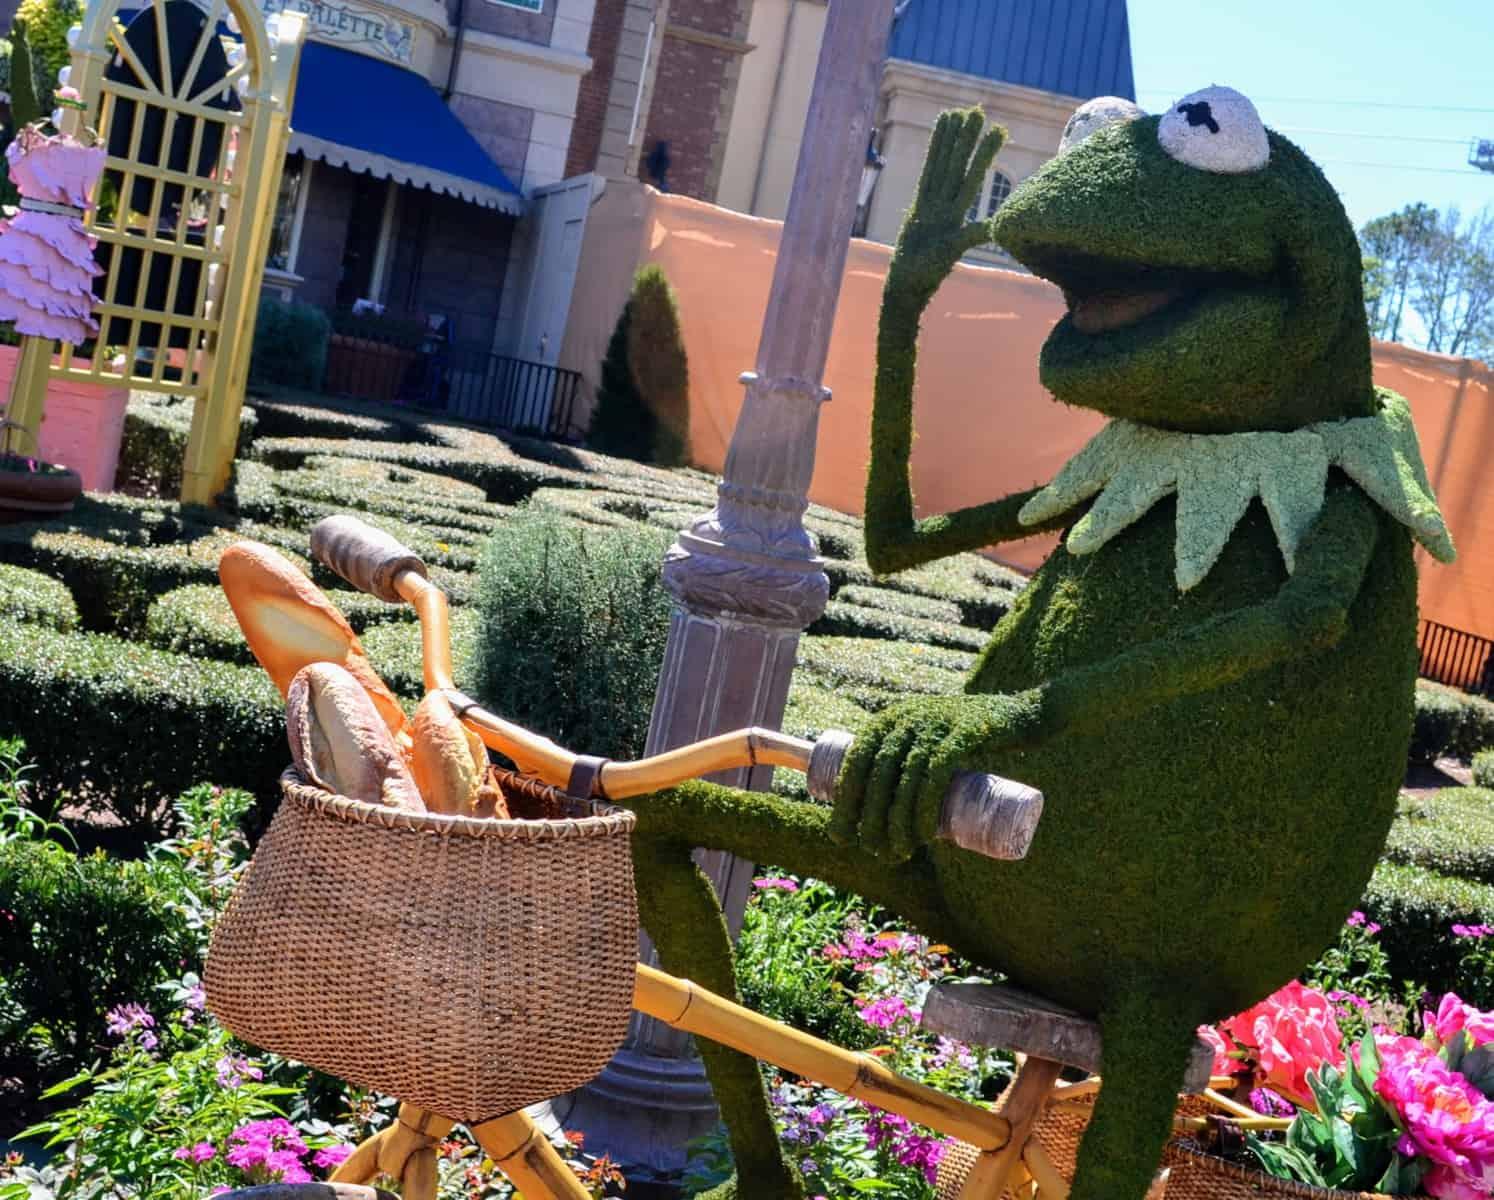 Kermit from Flower and Garden Festival